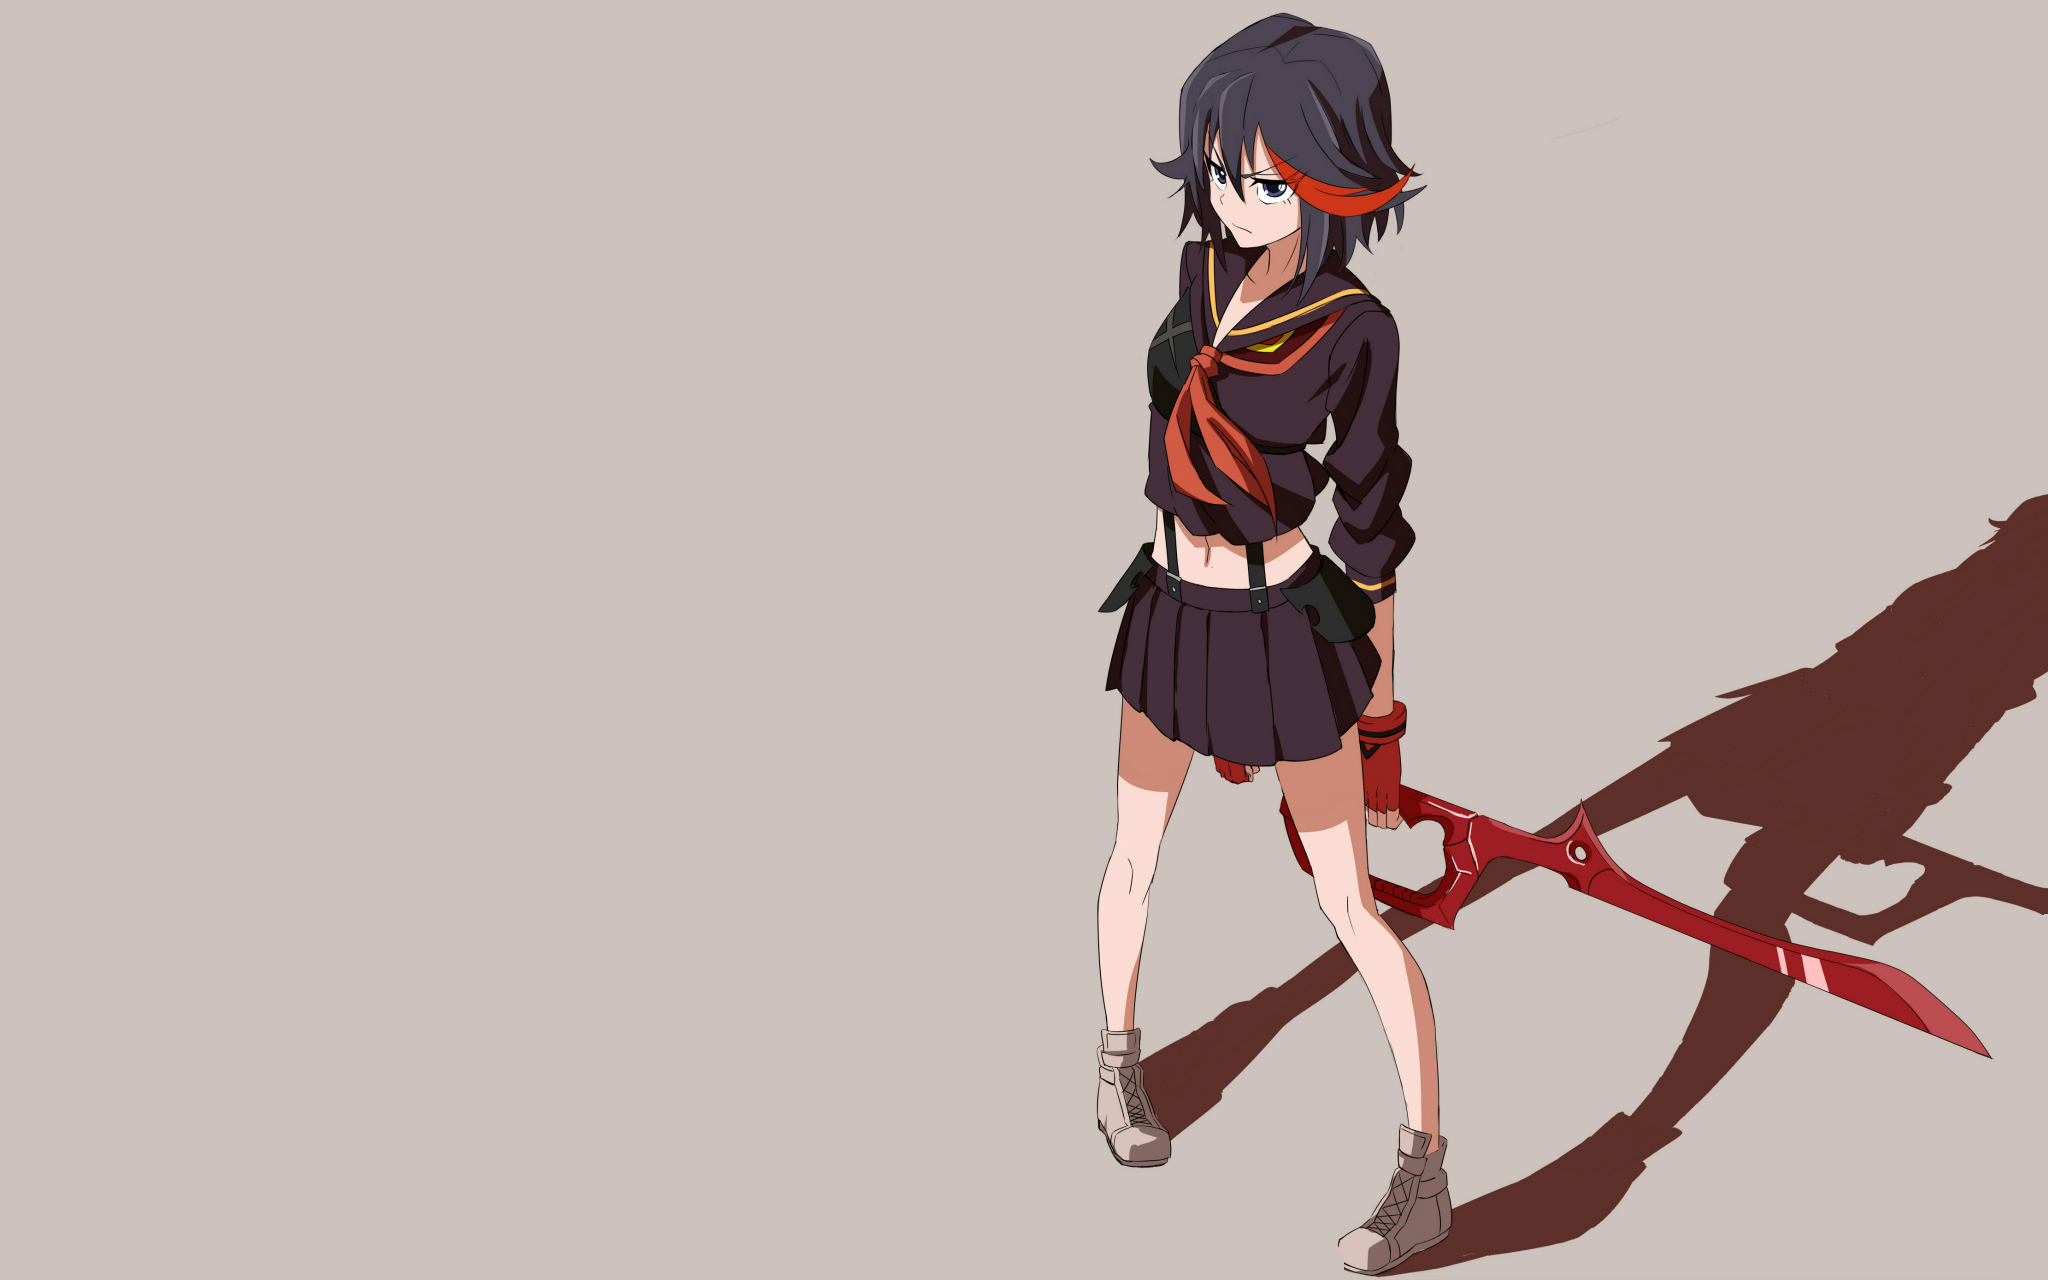 Kill la kill matoi ryuuko sword weapon wallpaper 2048x1280 156799 2048x1280